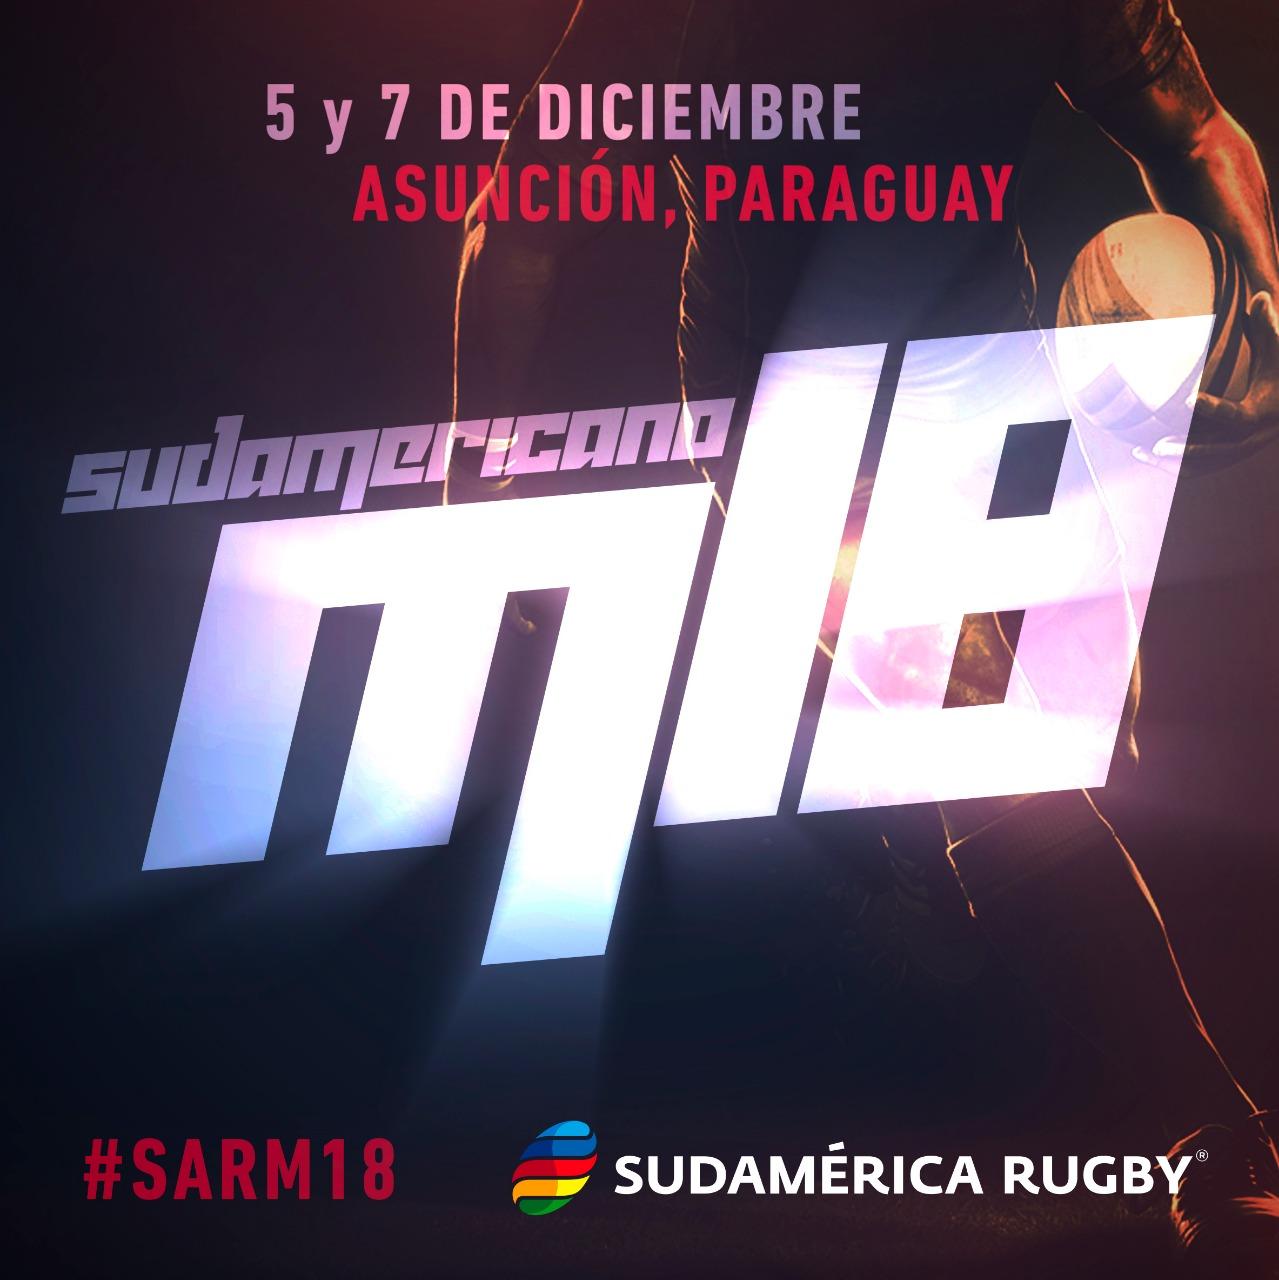 #SARM18 Challenge en Paraguay